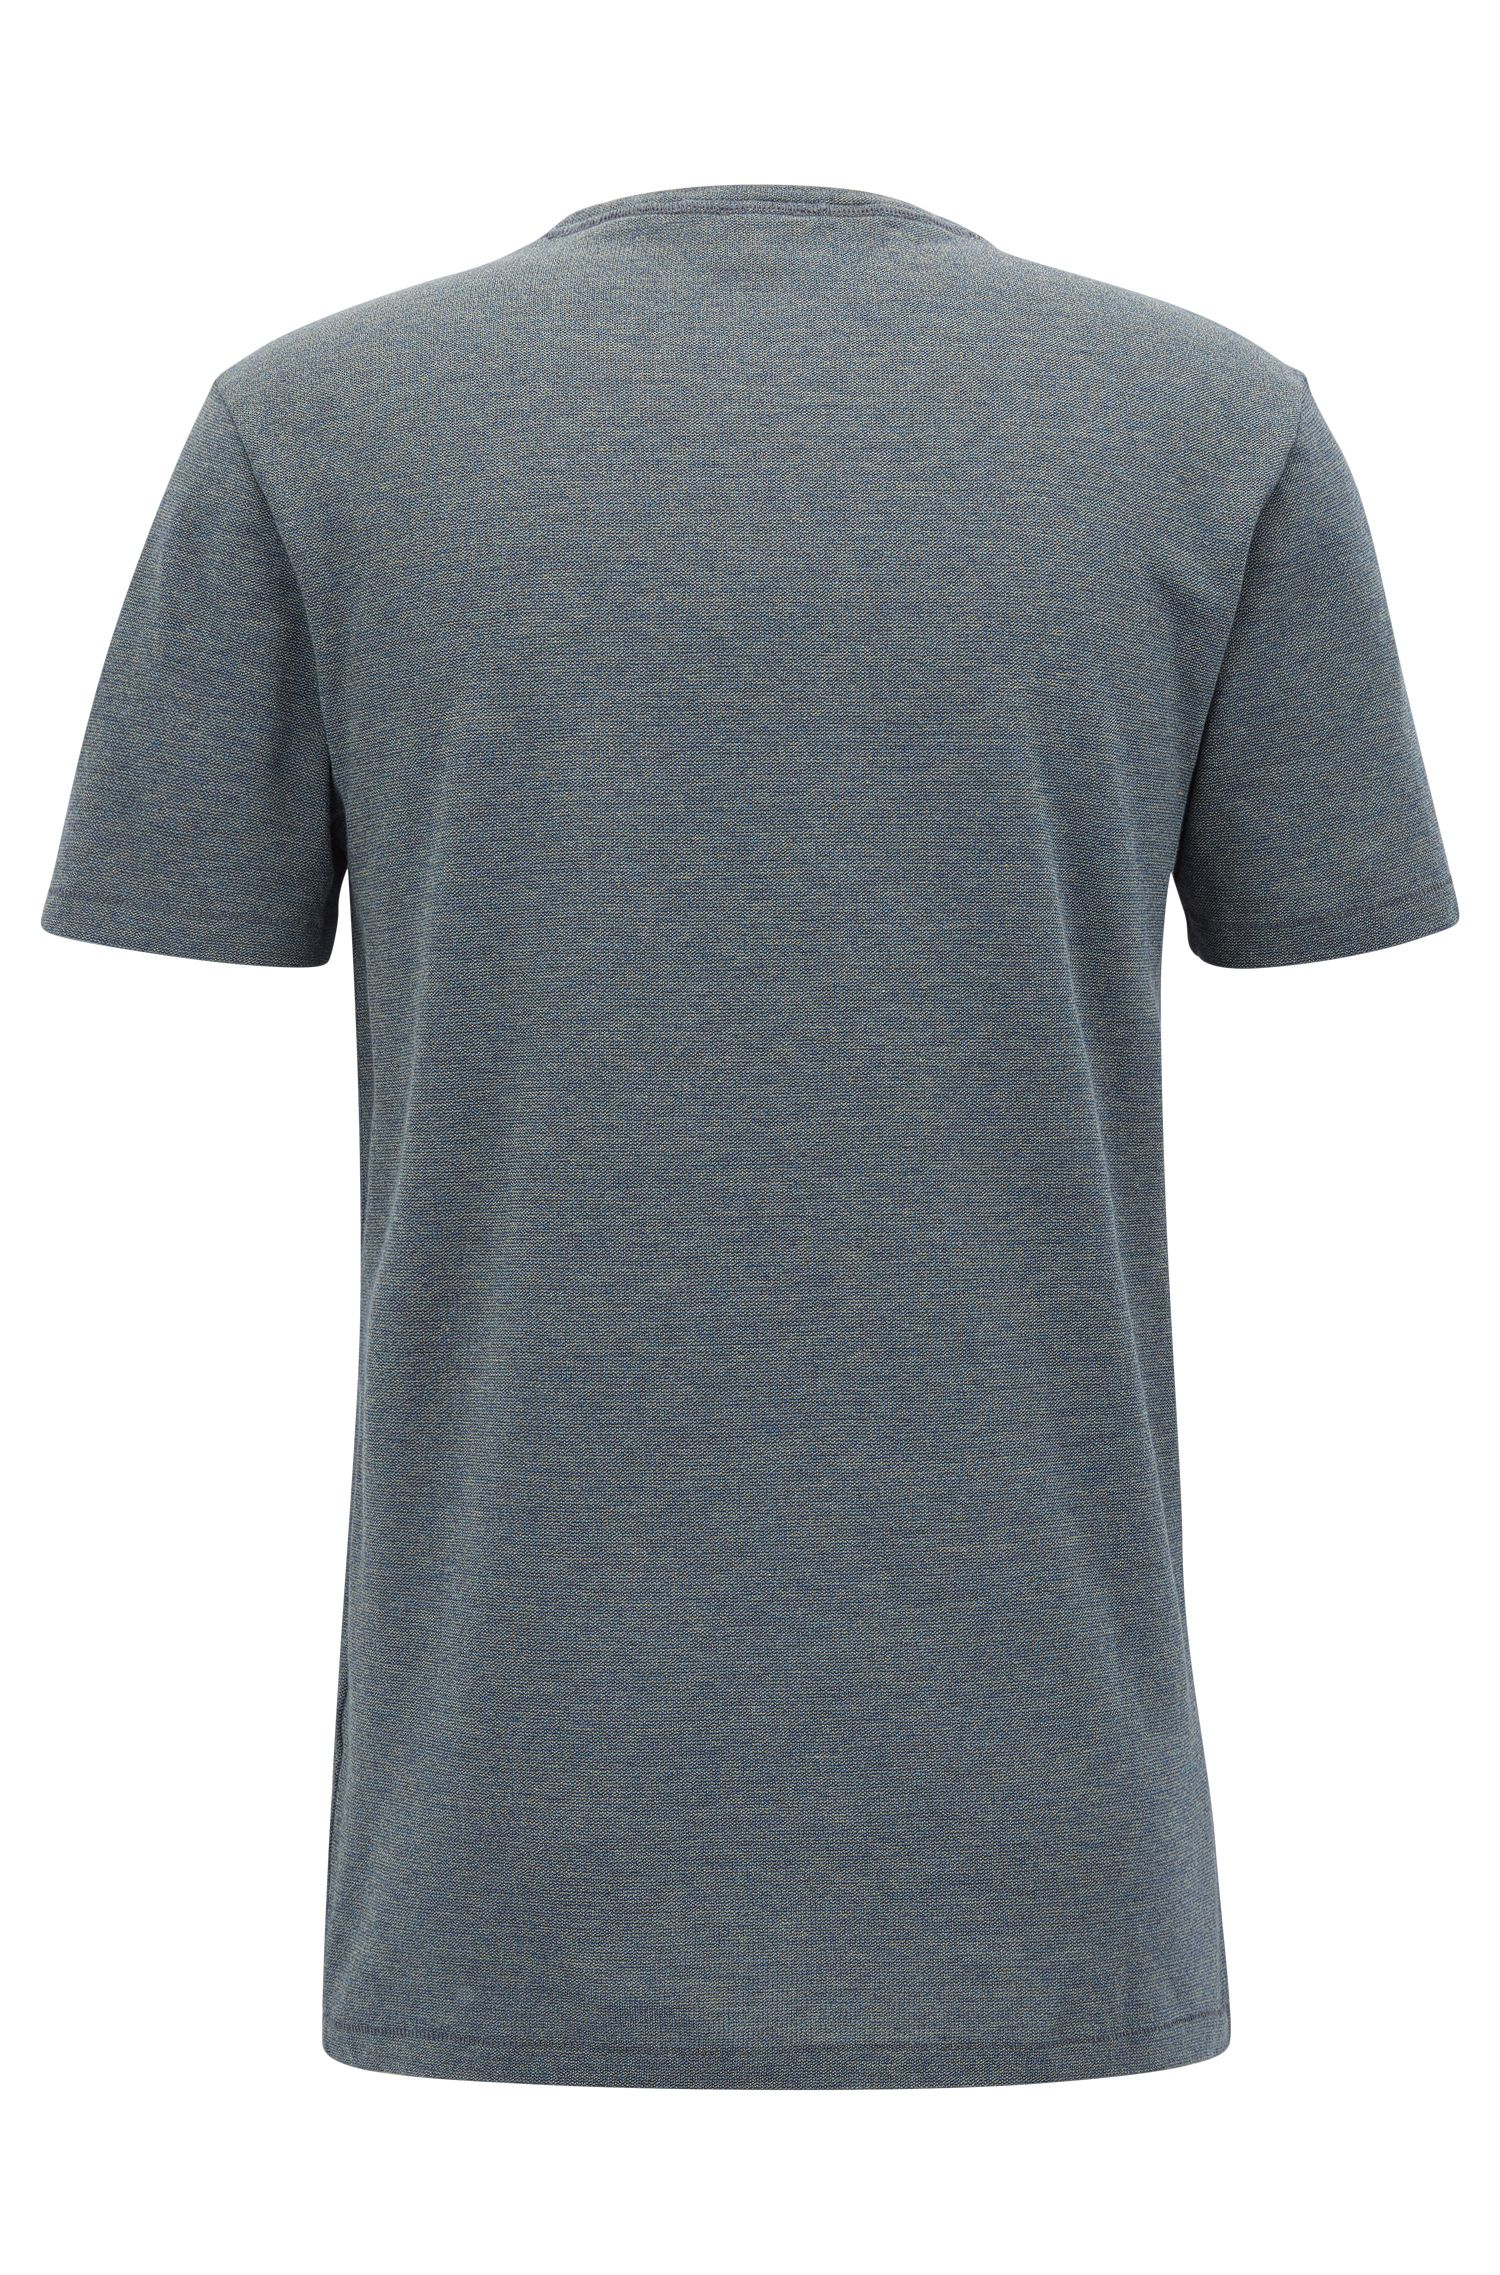 T-shirt a girocollo in cotone mouliné tinto in filo